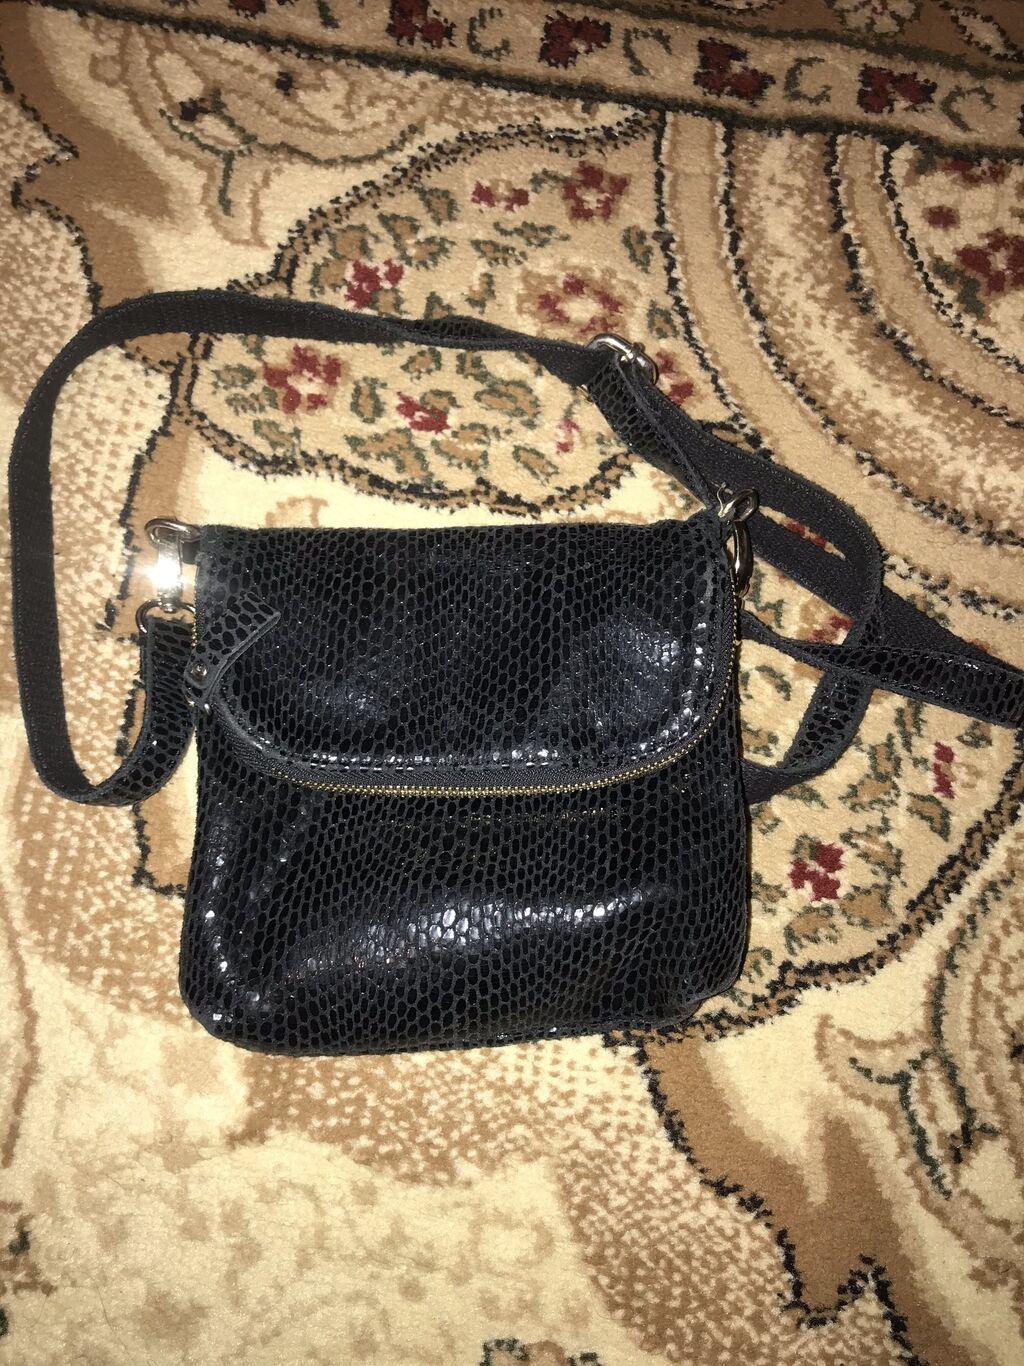 Продаю сумку лазерная кожа цена 900 сомов: Продаю сумку лазерная кожа цена 900 сомов